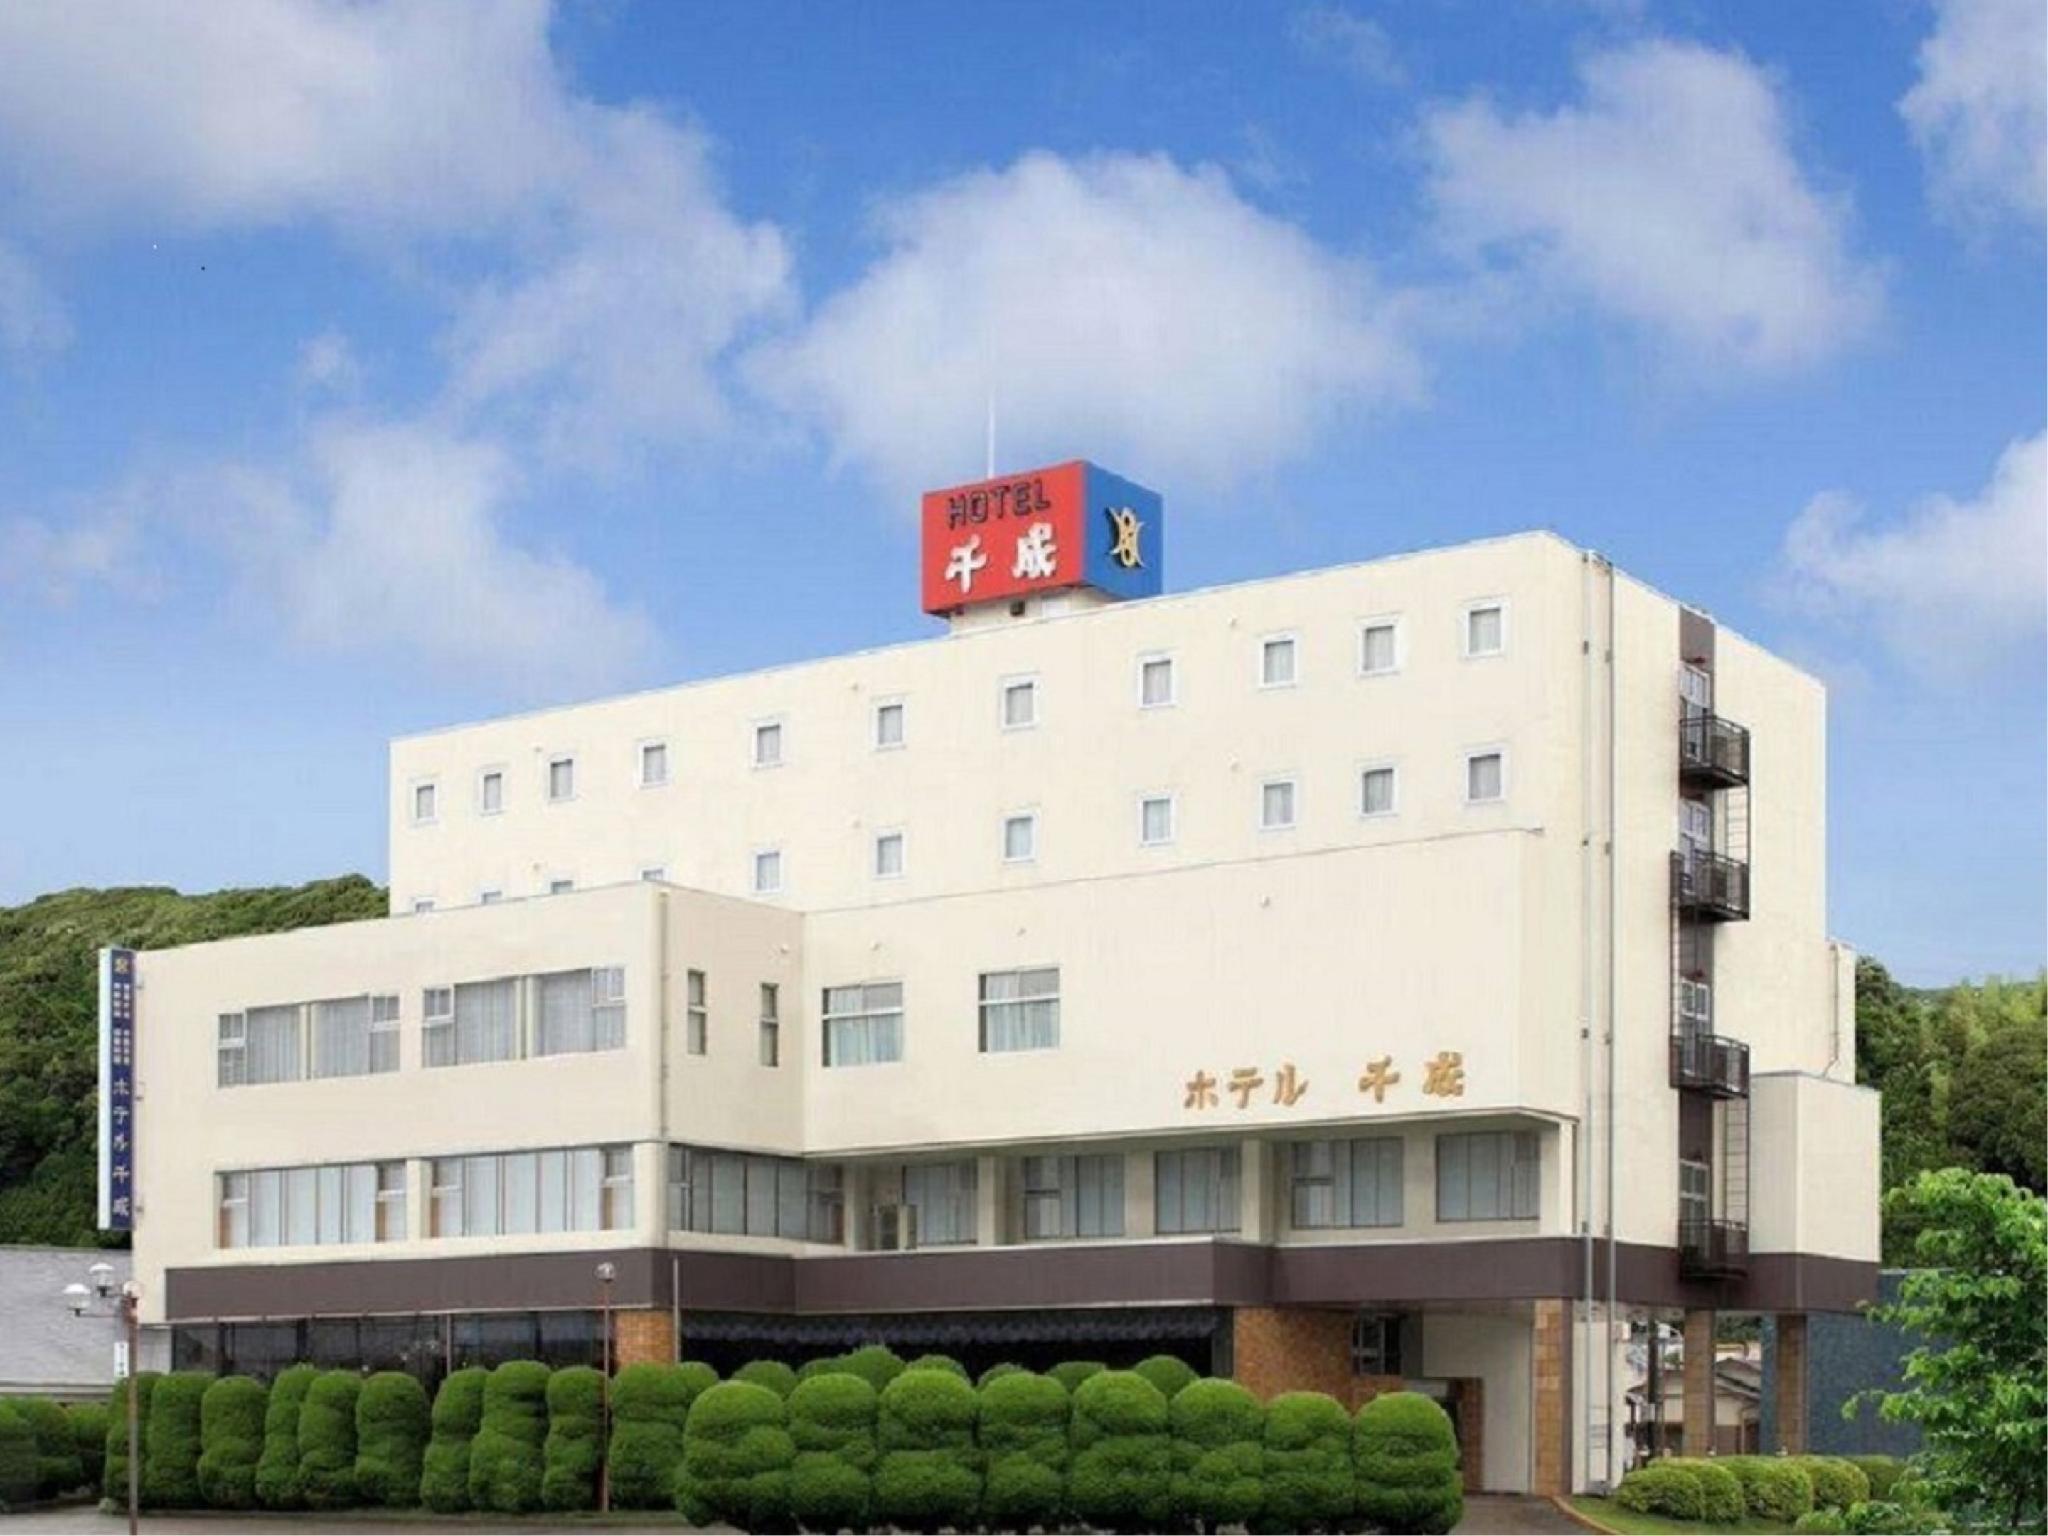 Hotel Sennari